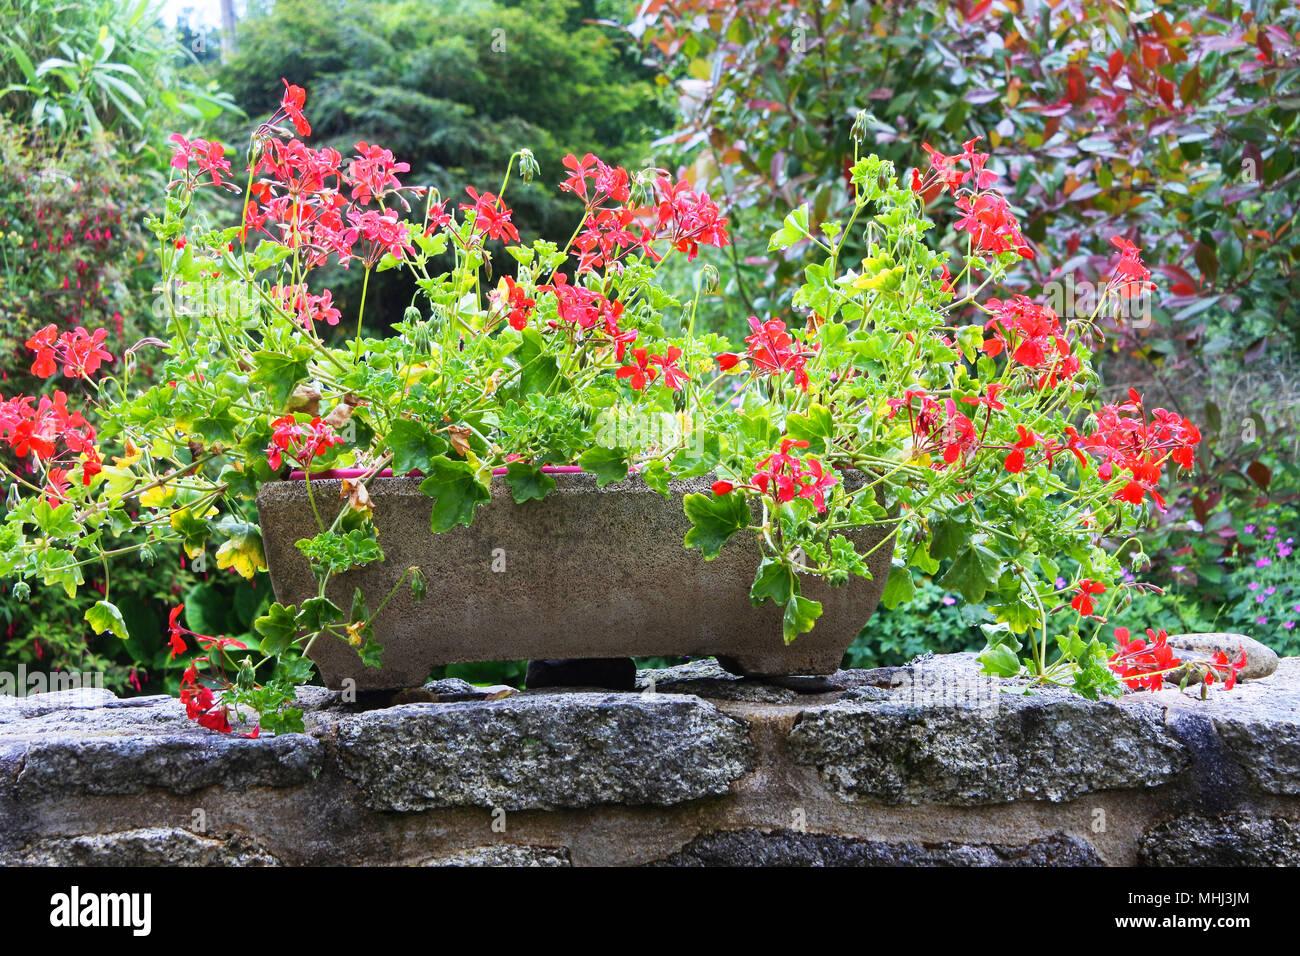 Flowering pelargoniums in a terra cotta window box - John Gollop - Stock Image